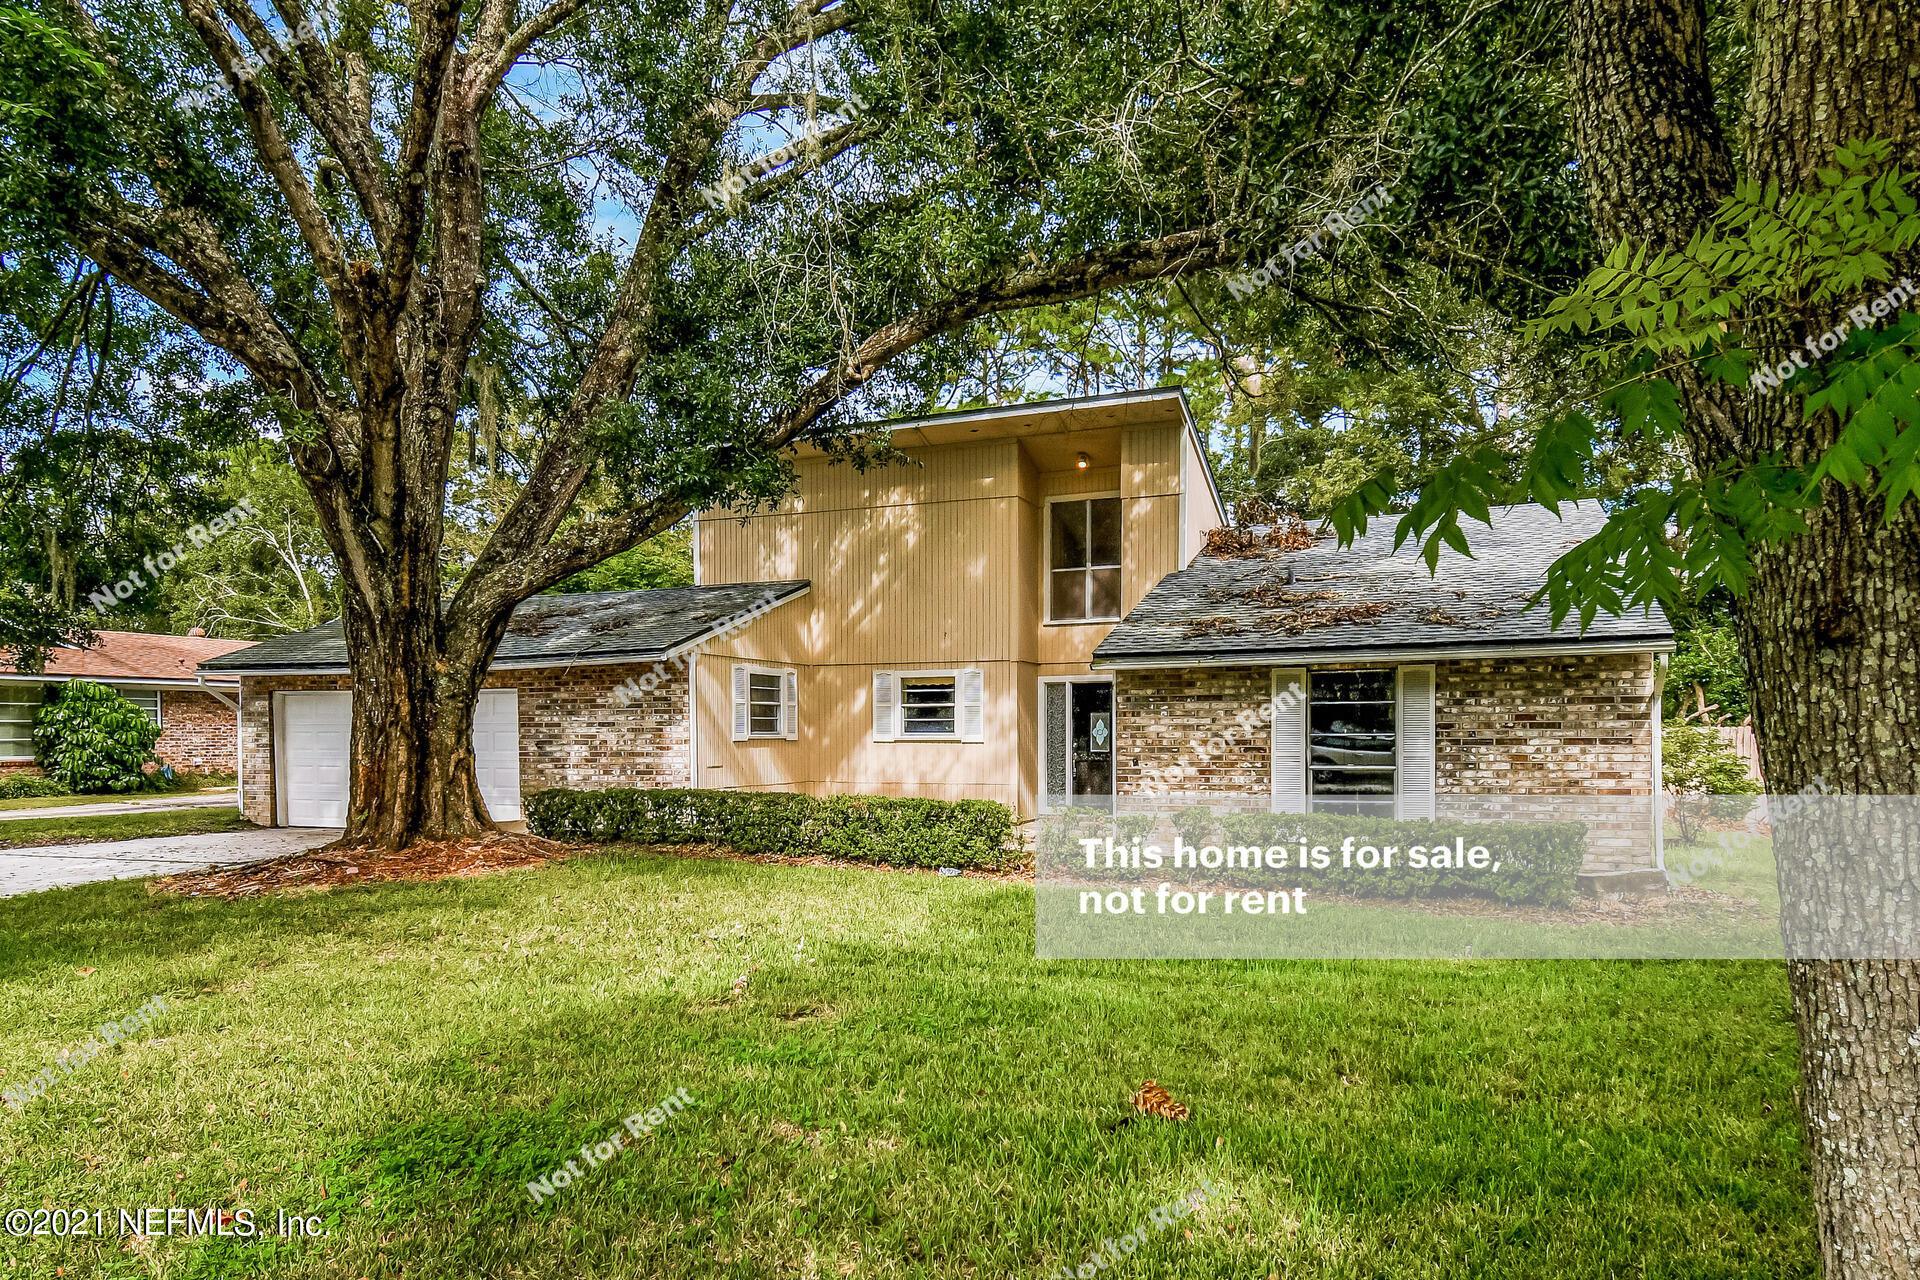 5210 RAINEY, ORANGE PARK, FLORIDA 32065, 3 Bedrooms Bedrooms, ,2 BathroomsBathrooms,Residential,For sale,RAINEY,1133263